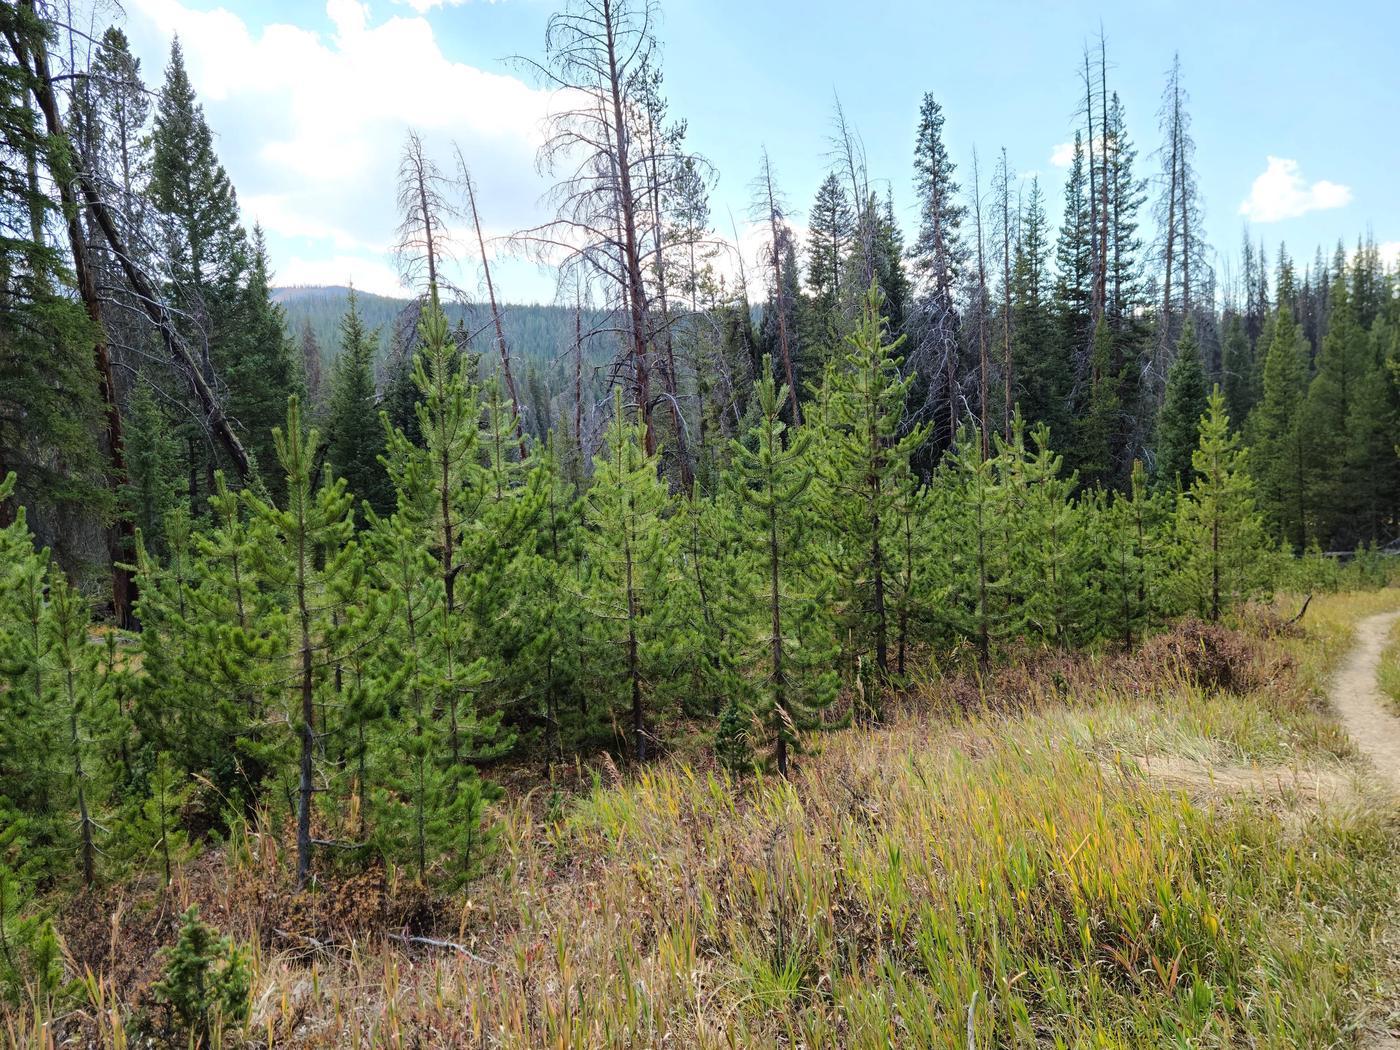 Pine treespine treees